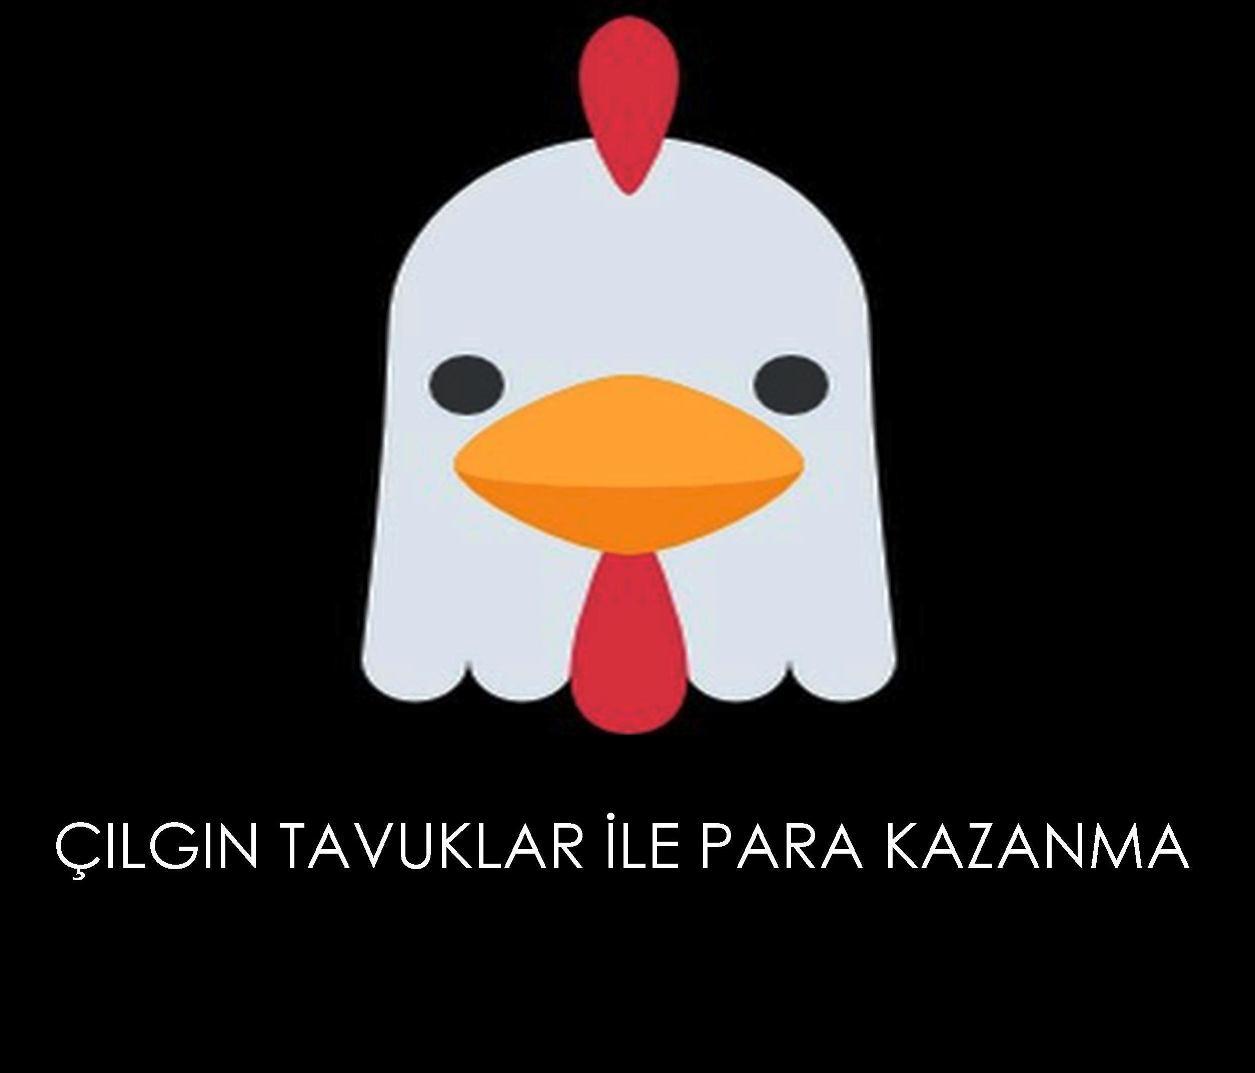 cilgin-tavuklar